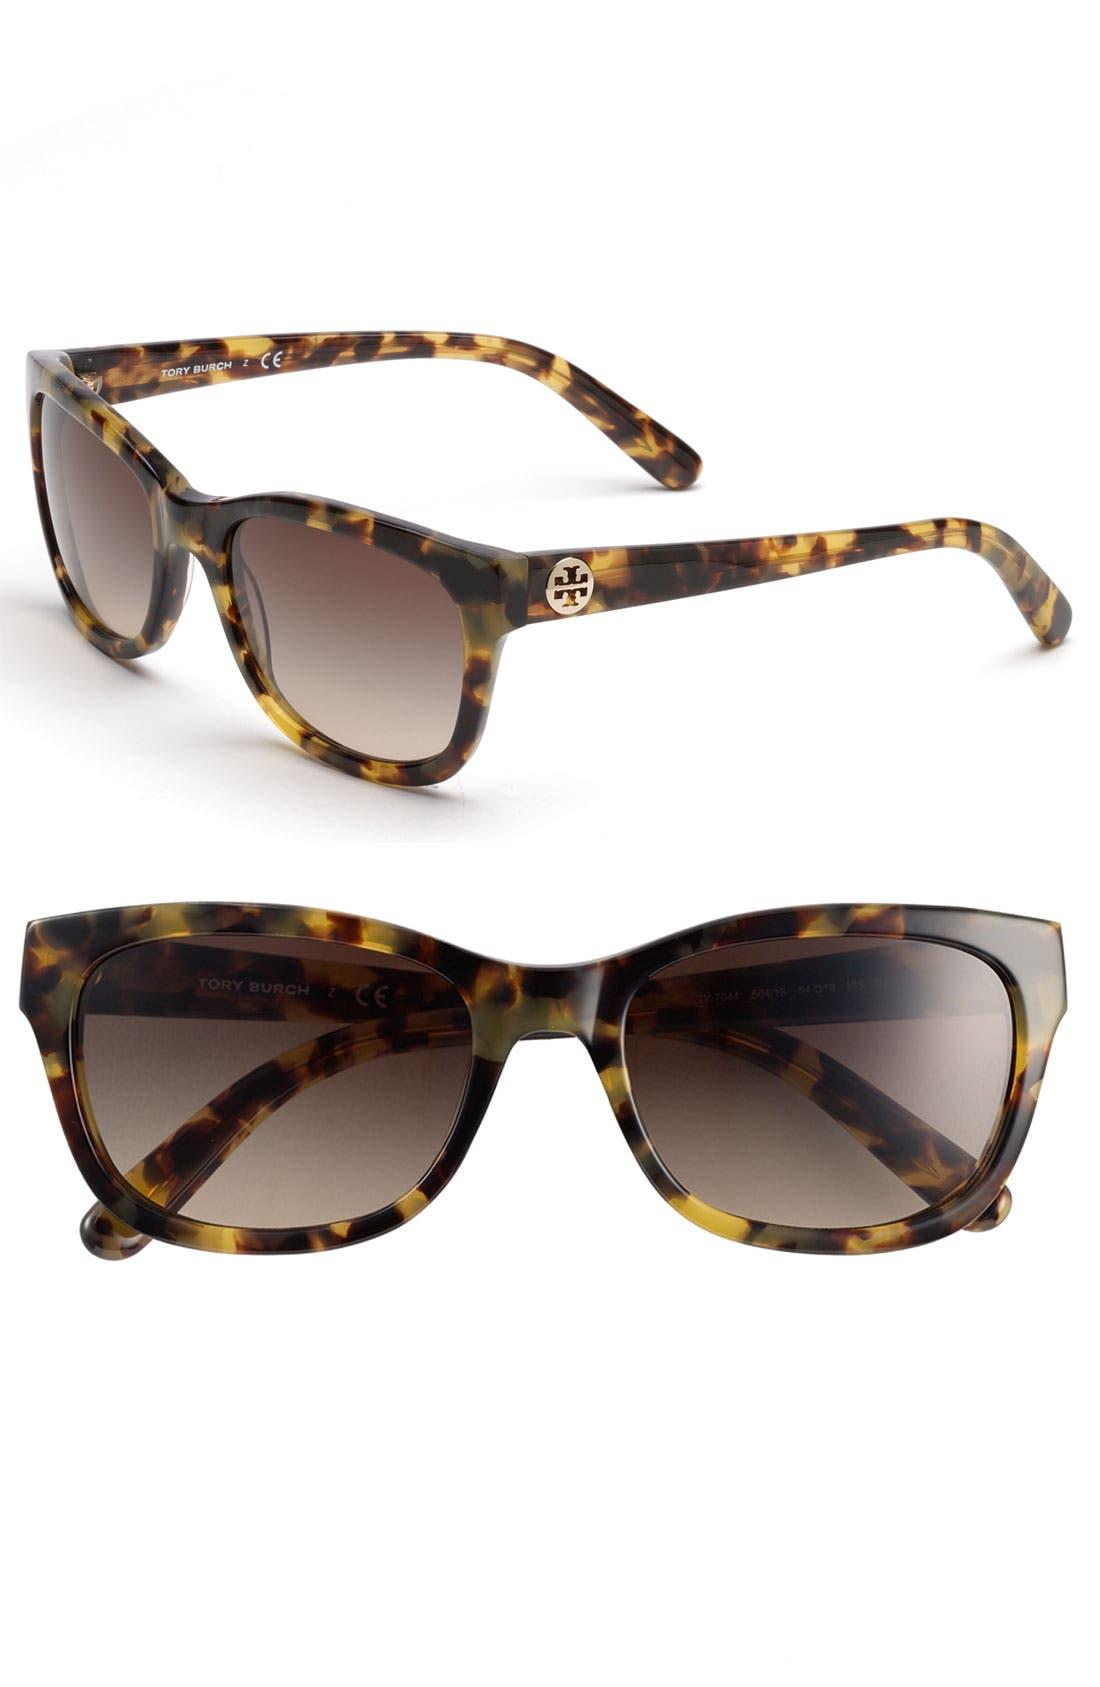 Alternate Image 1 Selected - Tory Burch 54mm Sunglasses